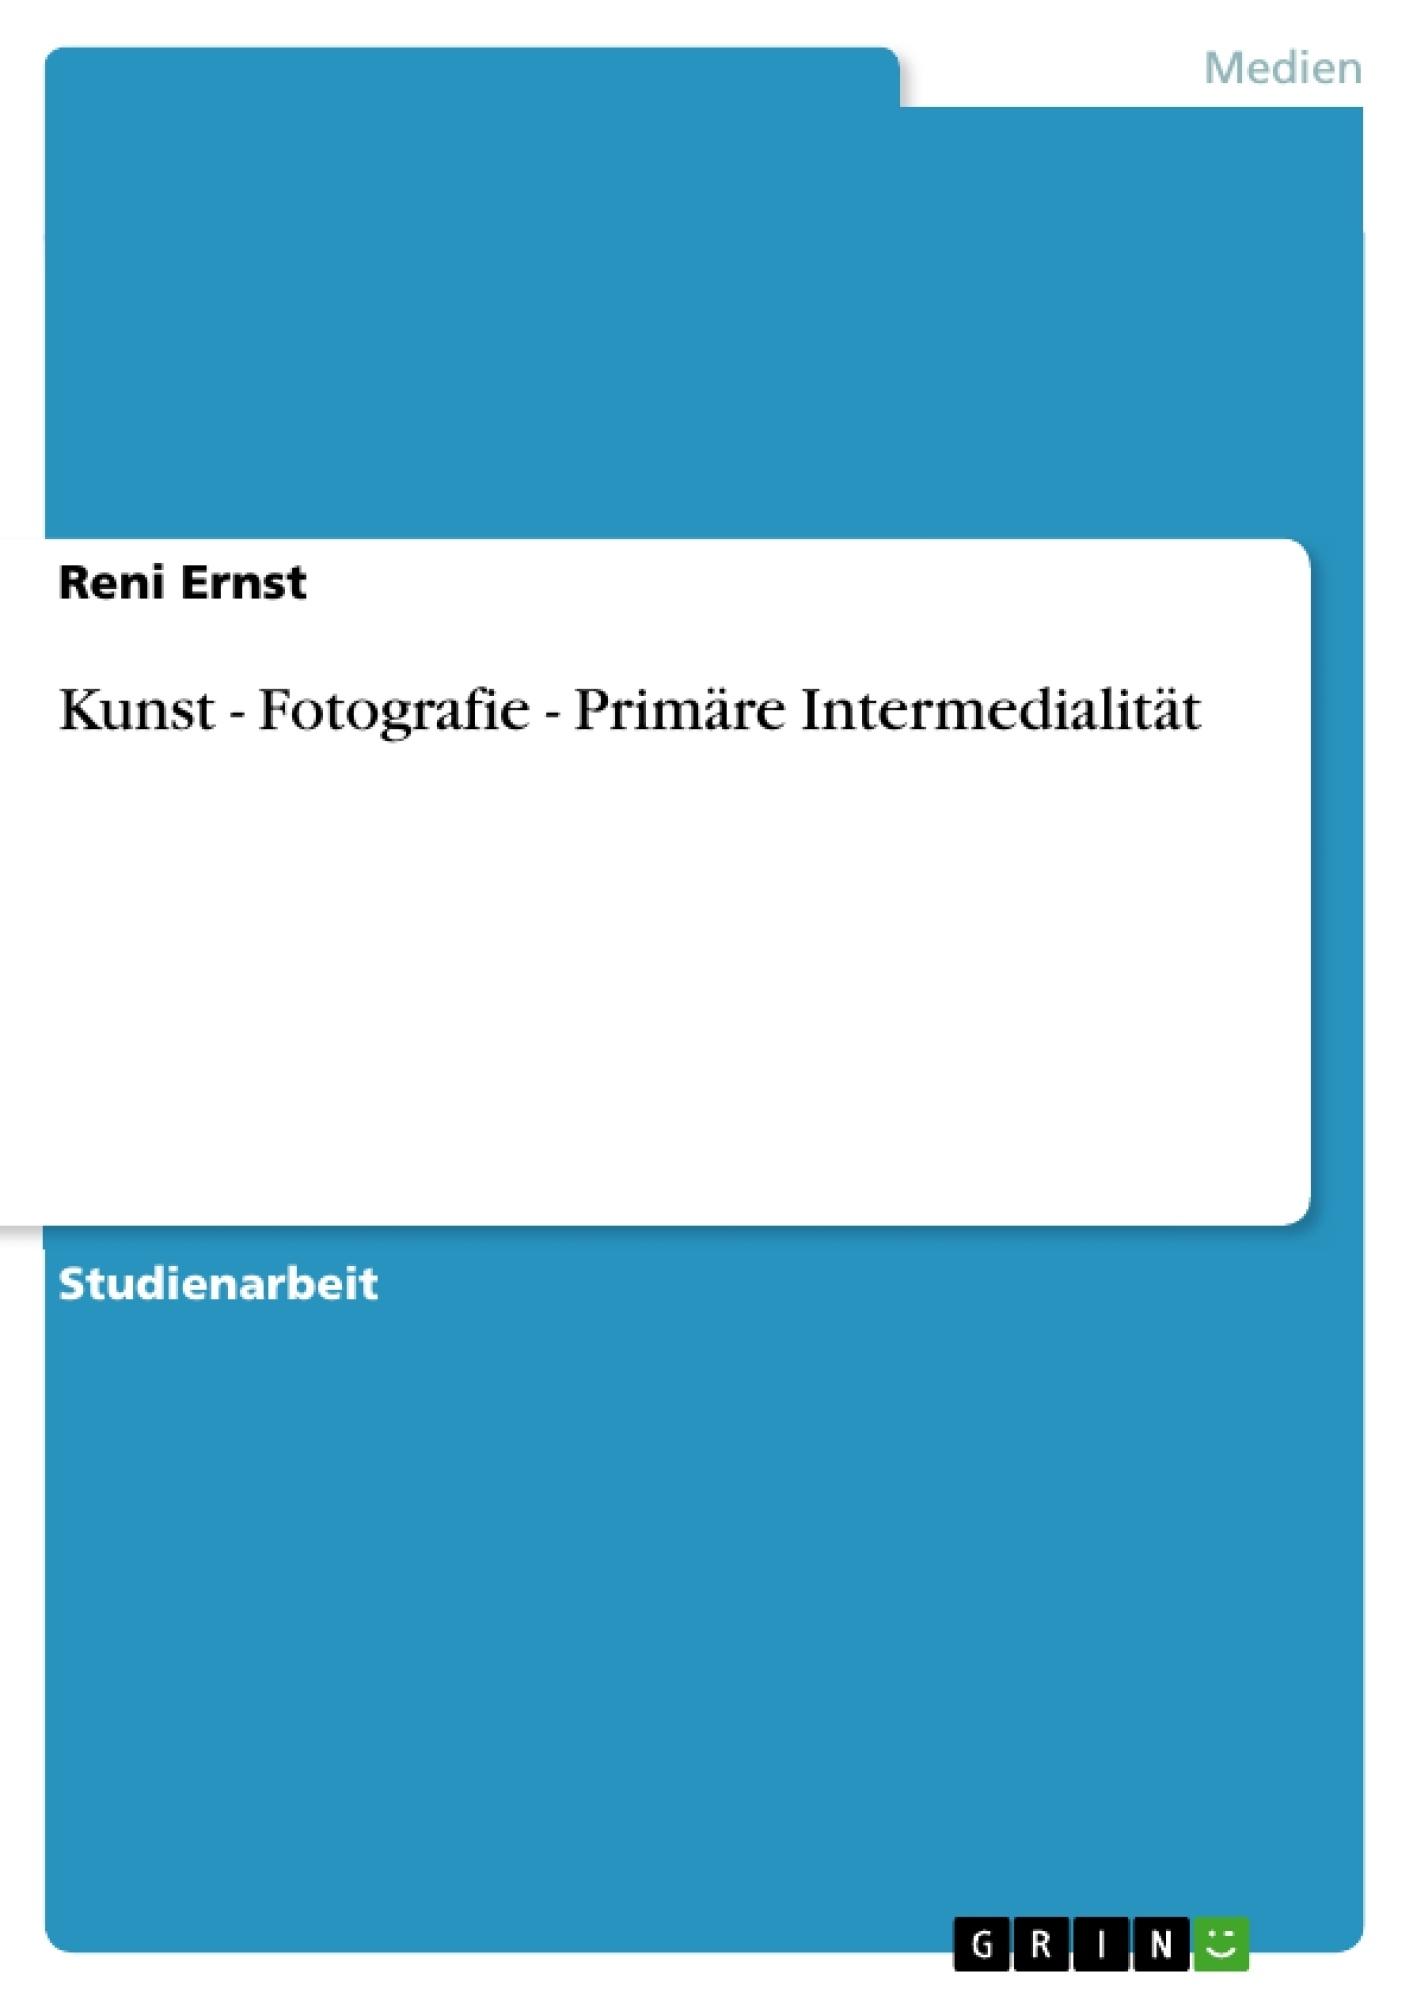 Titel: Kunst - Fotografie - Primäre Intermedialität